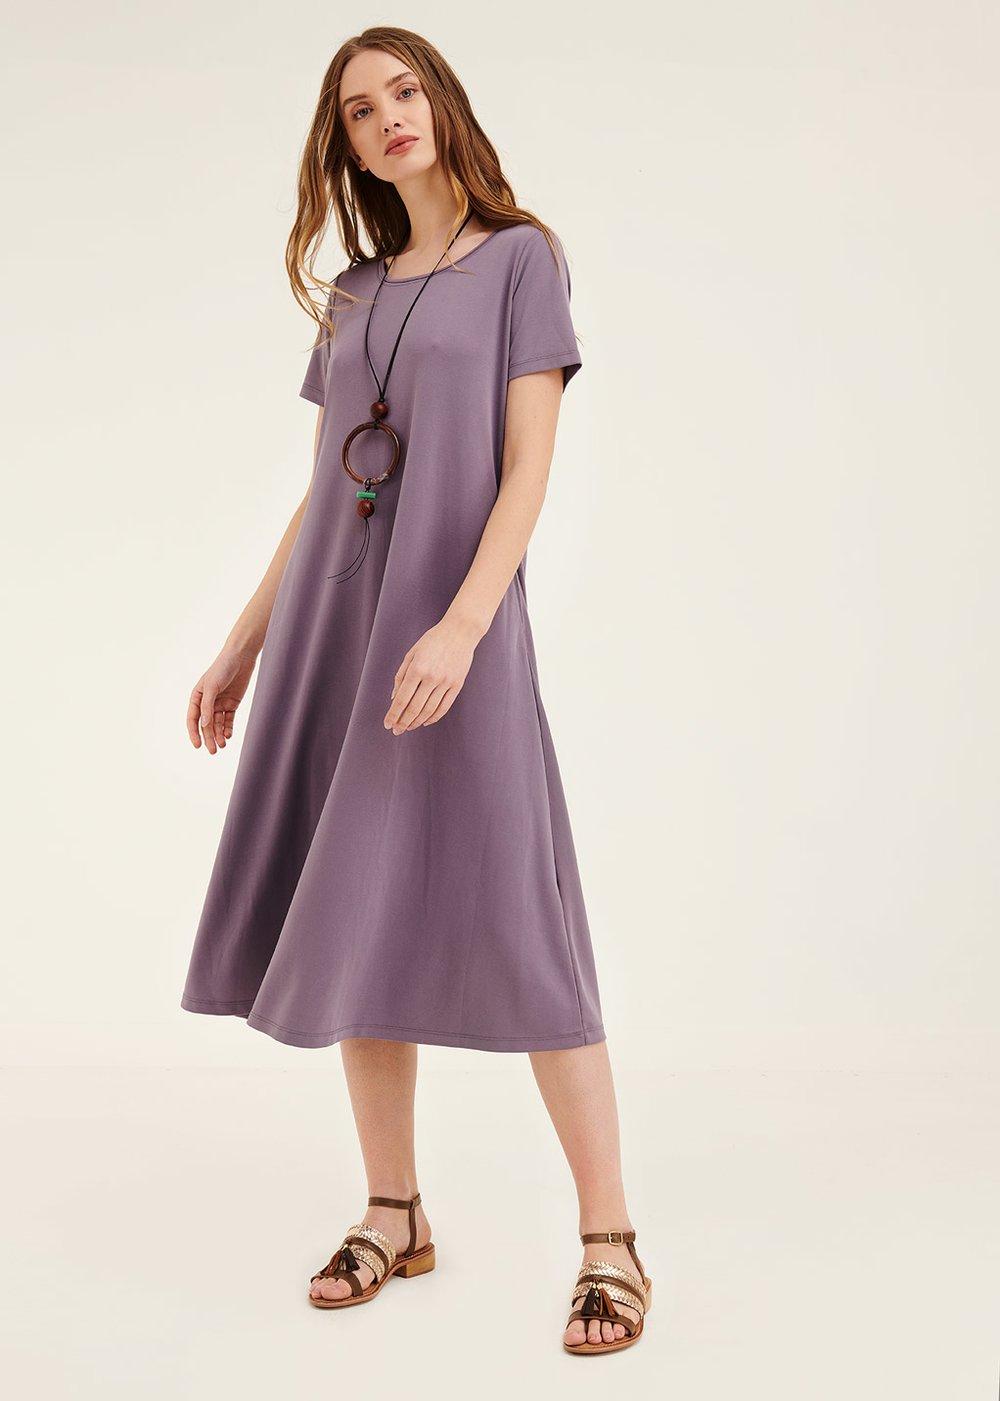 Andres modal jersey dress - Purple - Woman